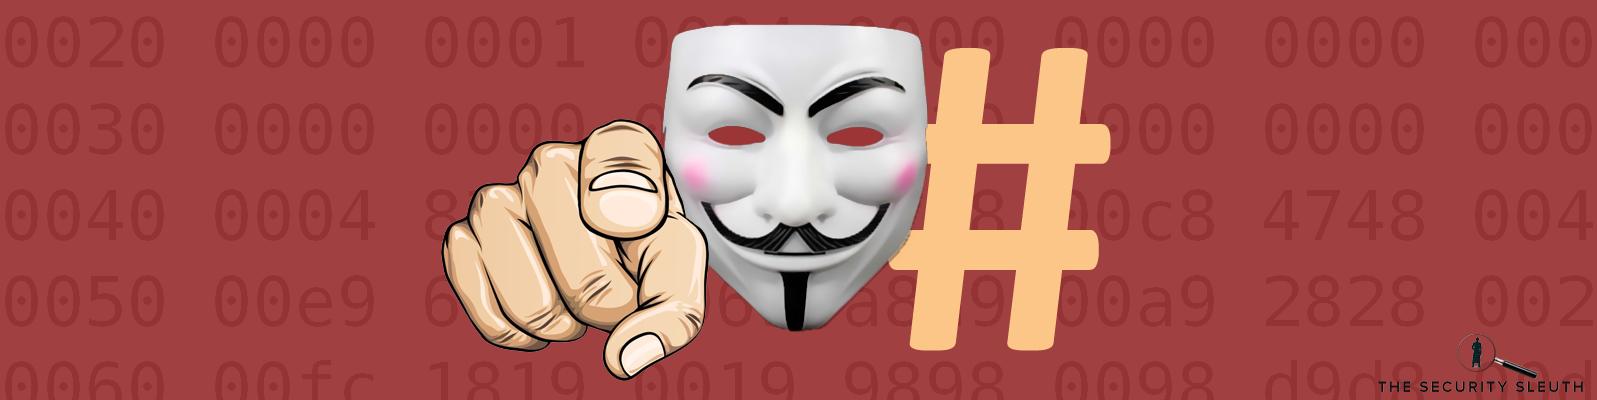 hackersandyou copy2.png